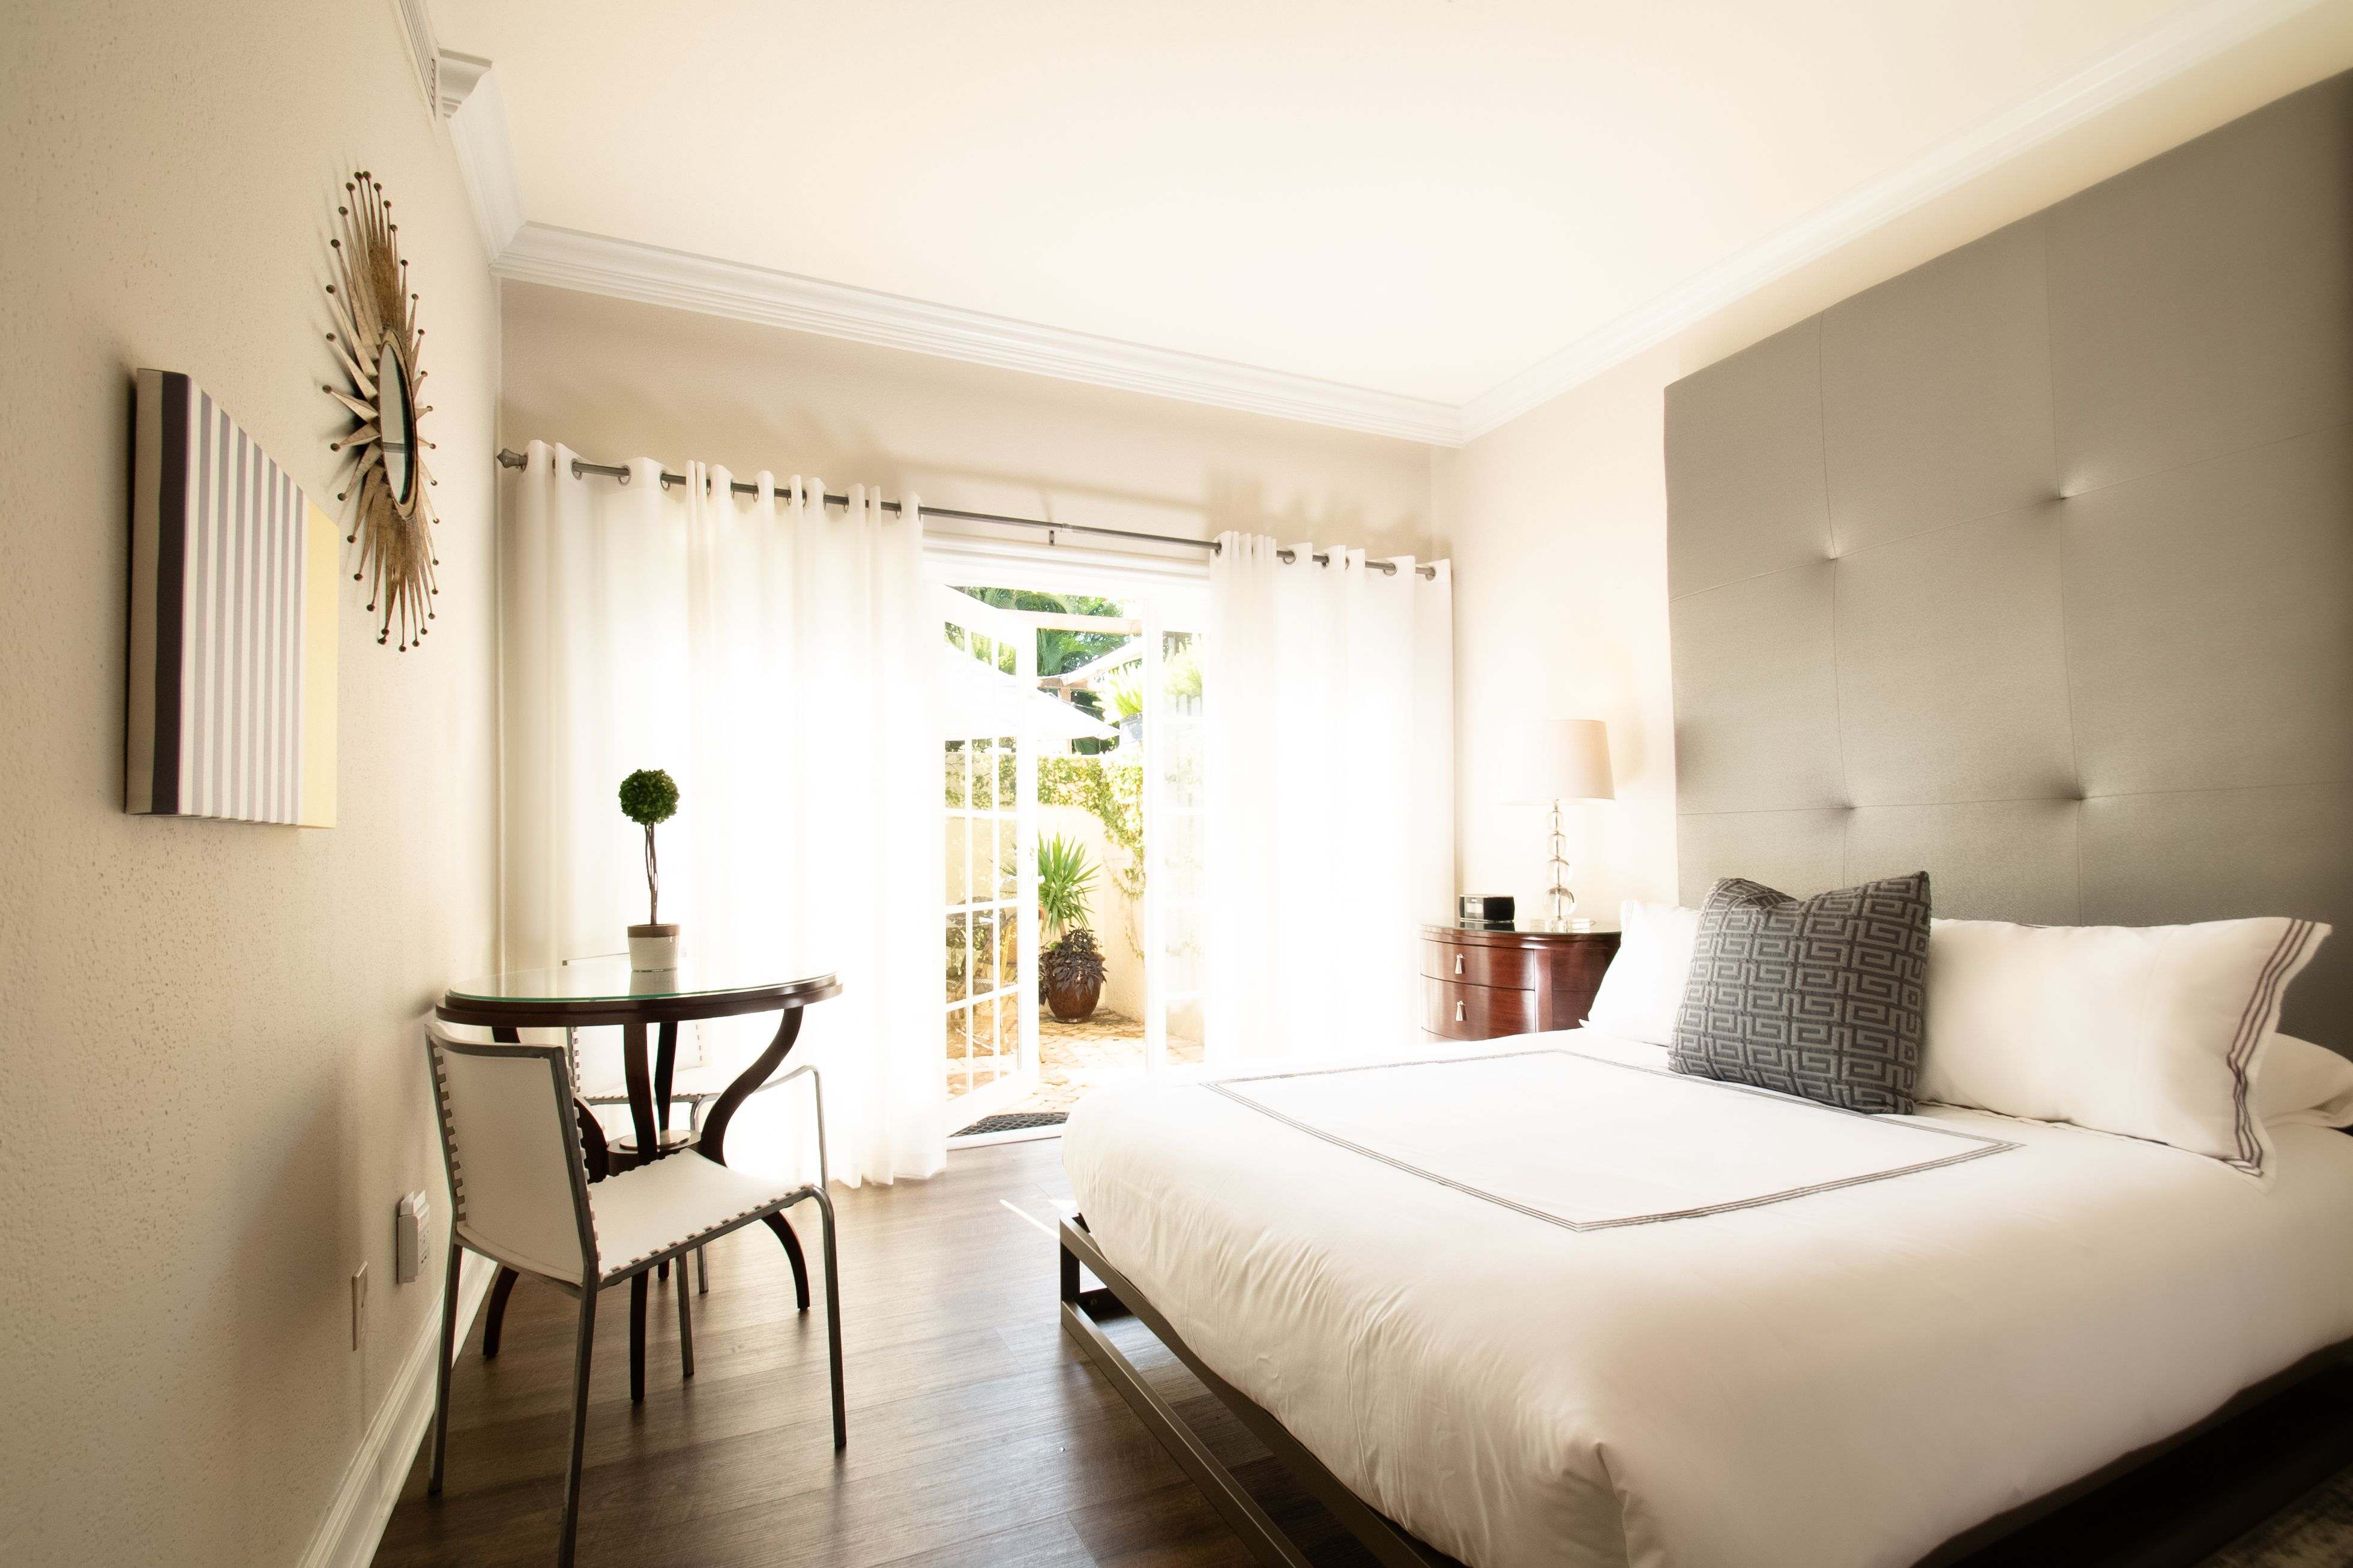 Luxurious bungalows with hidden private gardens awaits you at The Escalante! 🌴 ~~~~~~~~~~~~~~~~~~~~~~~~~~~~~~~~~~#escape #relax #hiddenoasis #naples #florida  #hoteldeals #courtyard  #getaways #beach  #vacation #pool #tourist #traveler #hotelescalante #naples #hospitality #daycation #staycation #travelblogger #southflorida #resort #luxury #travel  #hoteldeals  #boutiquehotel  #getaways